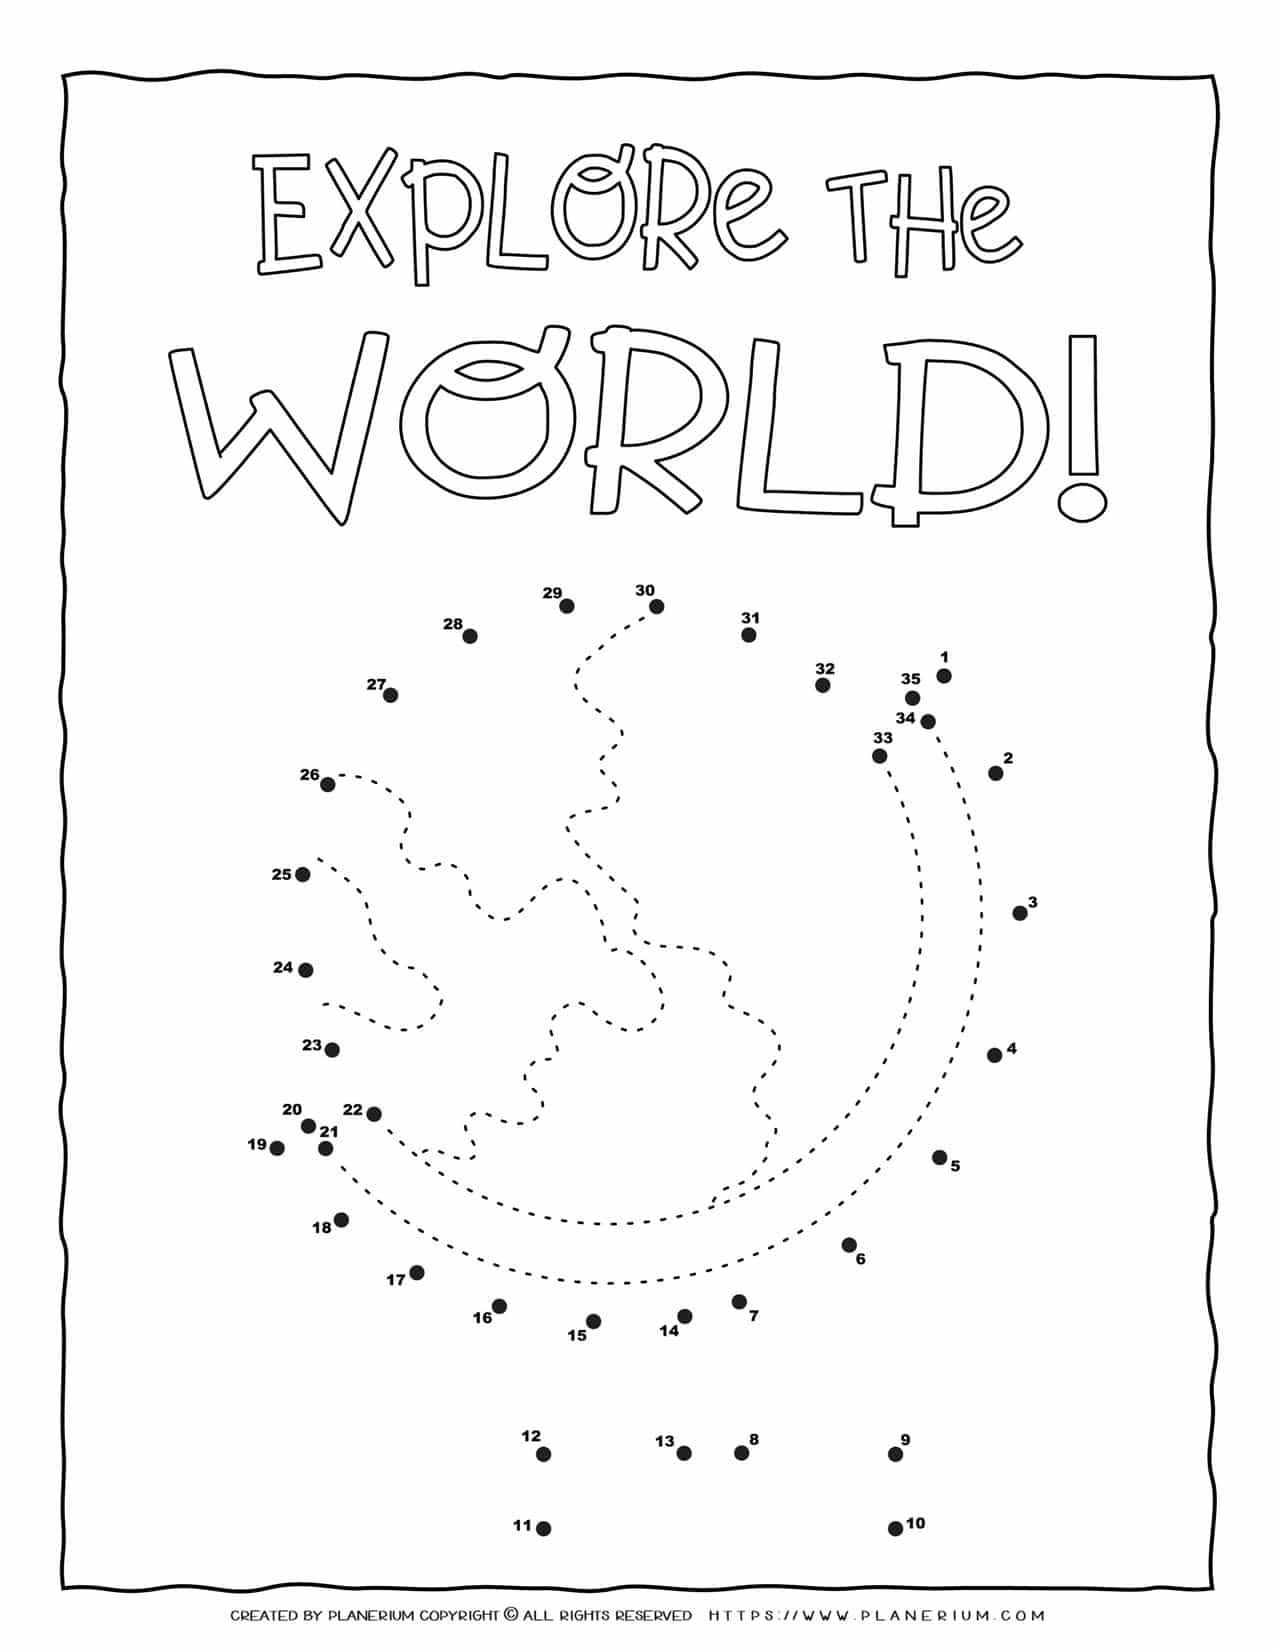 Explore The World - Connect The Dots | Planerium